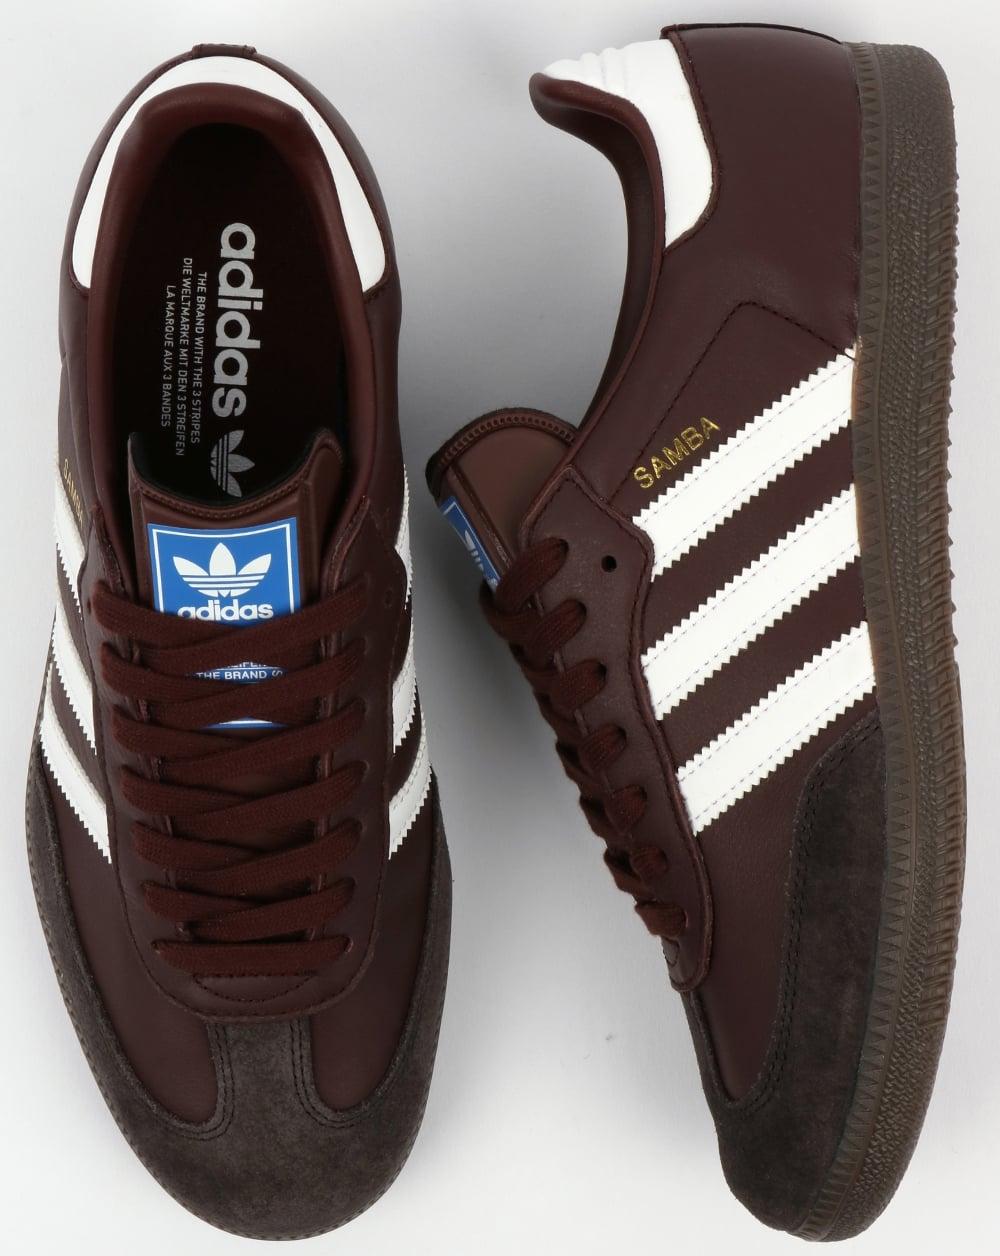 Adidas Più Brown Samba Cheap >Off62% Più Adidas Grande Catalogo Sconti 80a776